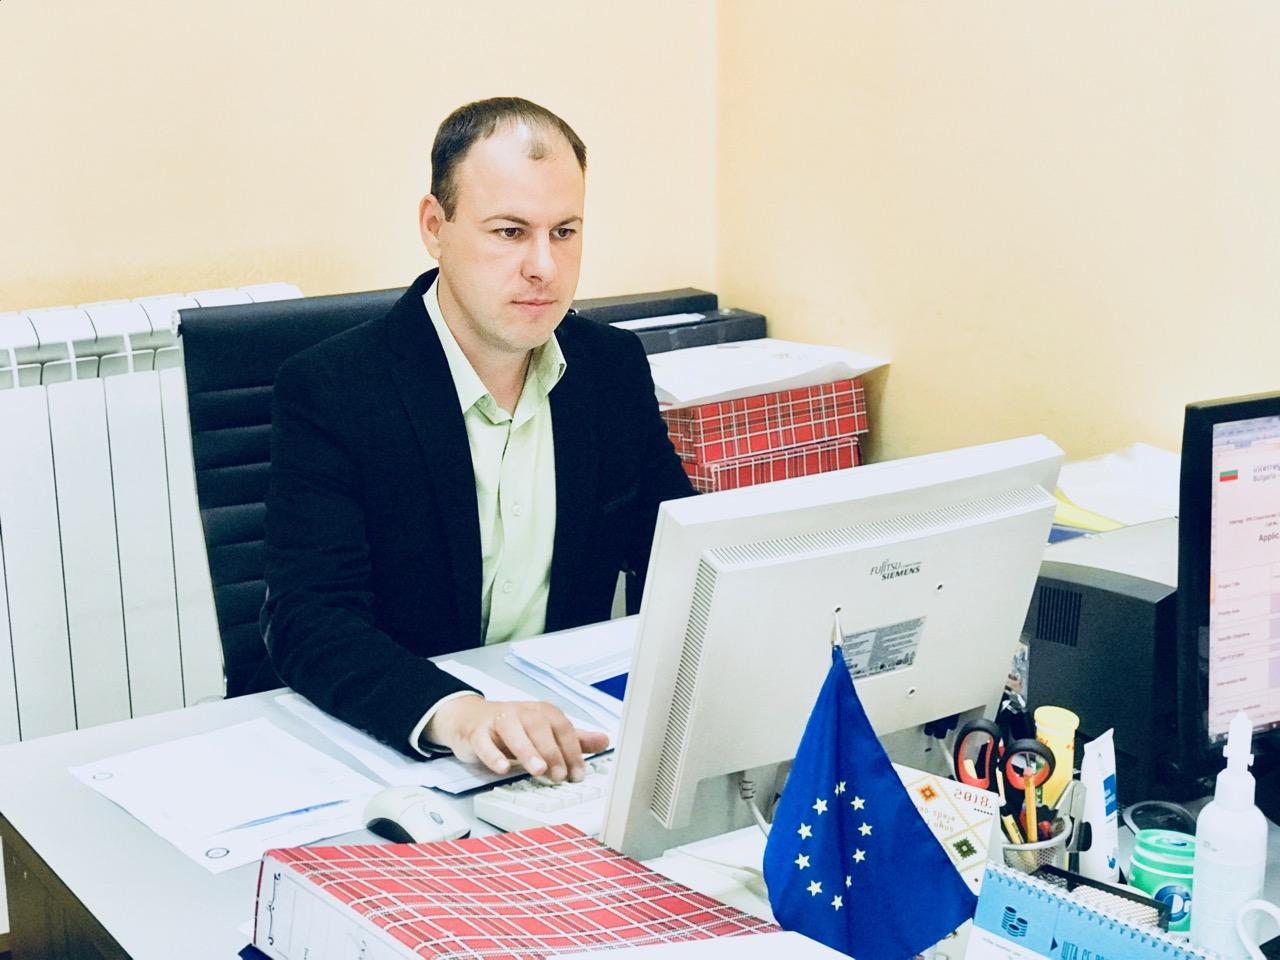 Photo of Grad Pirot doneo odluke o realizaciji tri programa zapošljavanja u 2018. godini